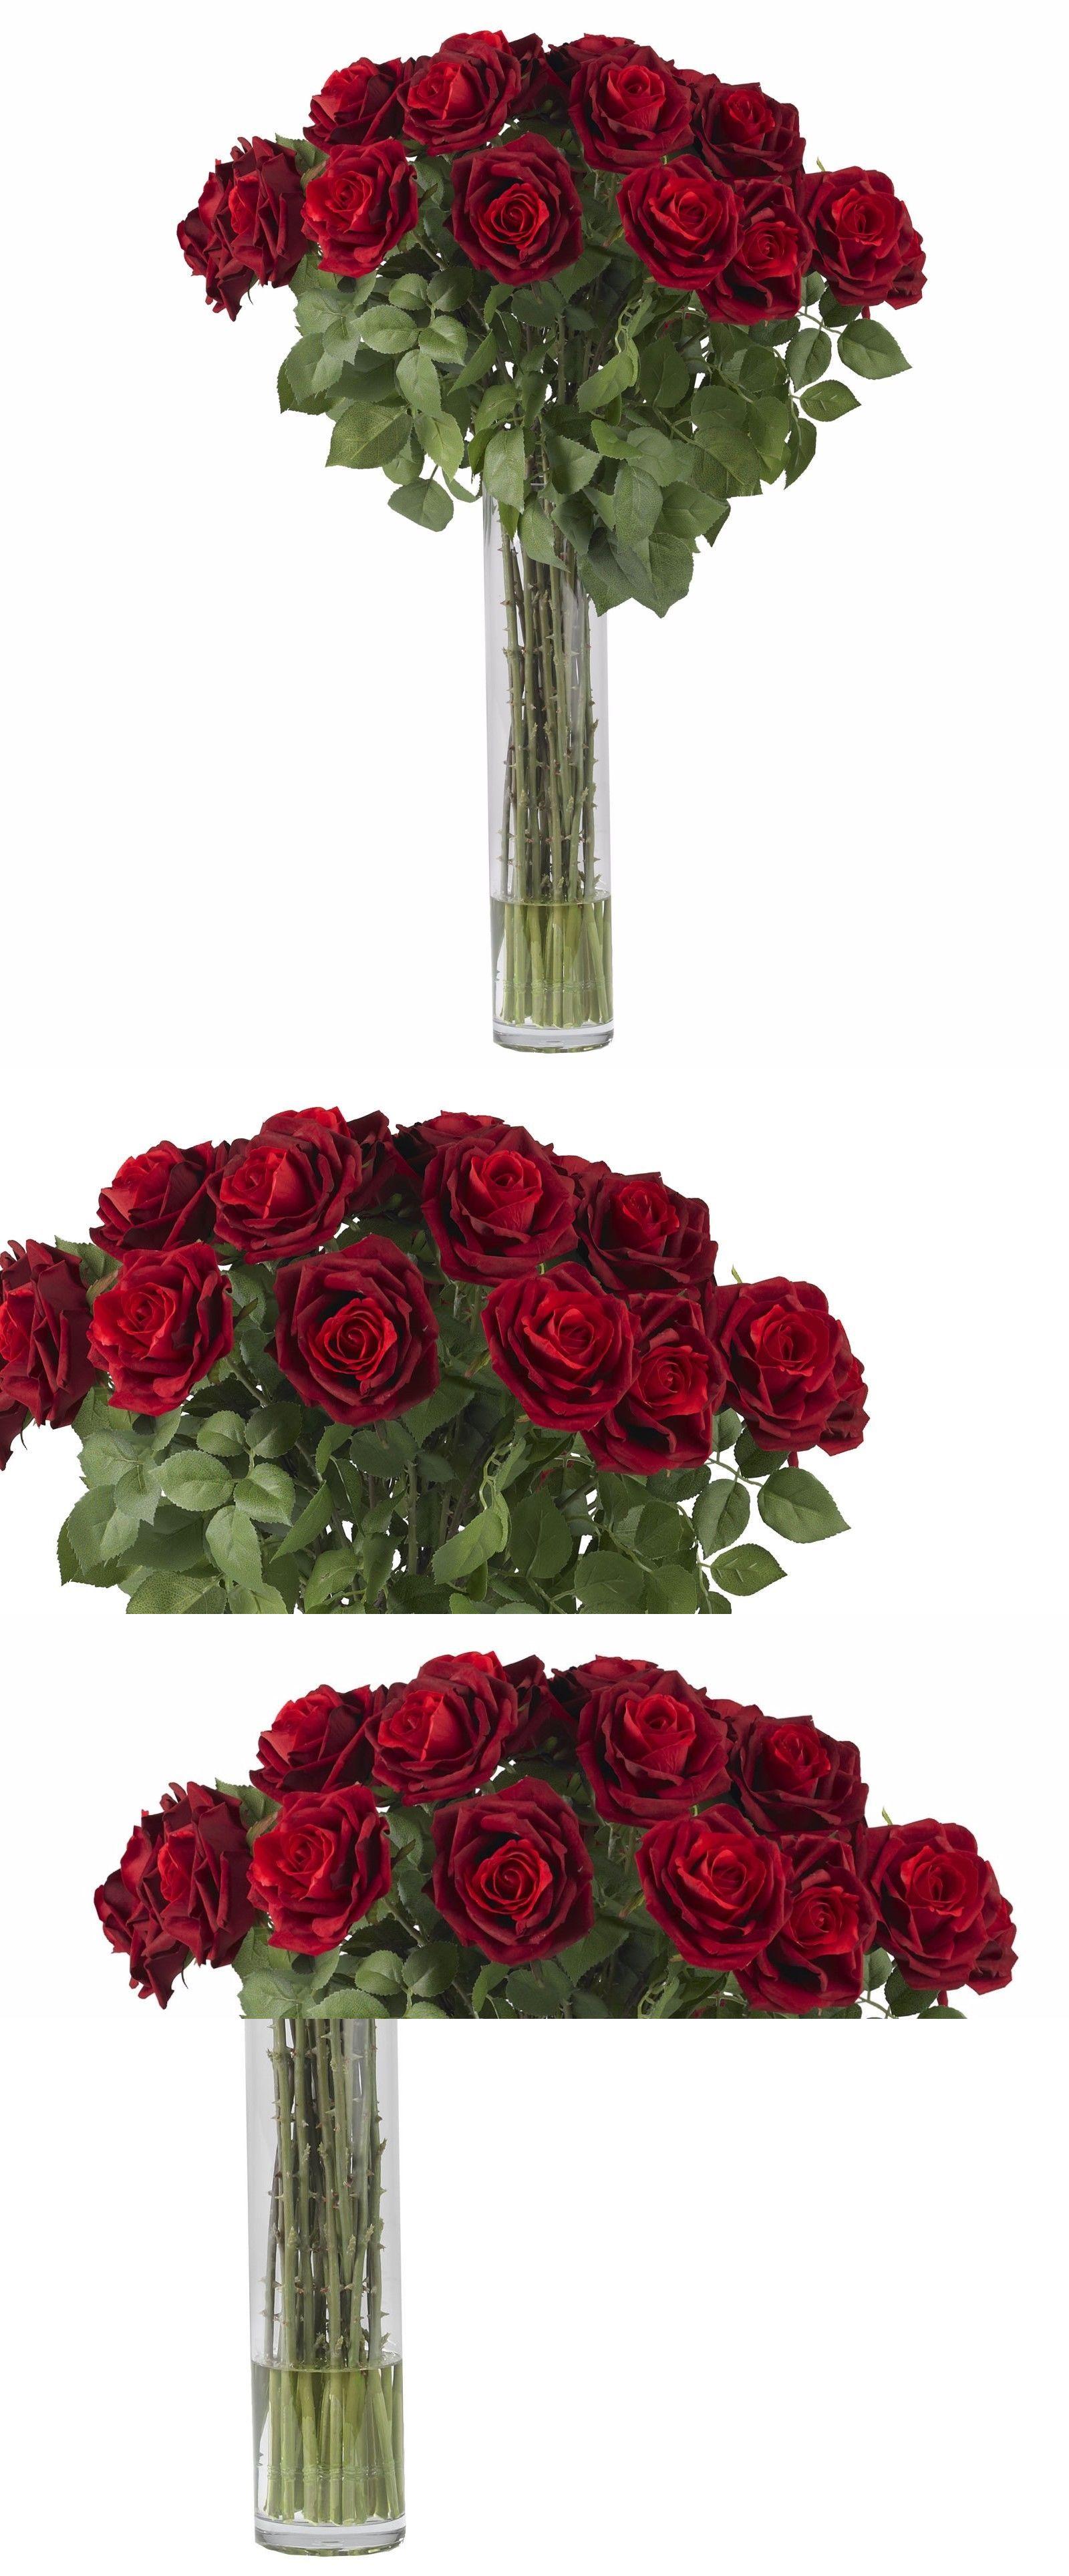 Silk Flowers 16494 Large Rose Silk Flower Arrangement With Vase